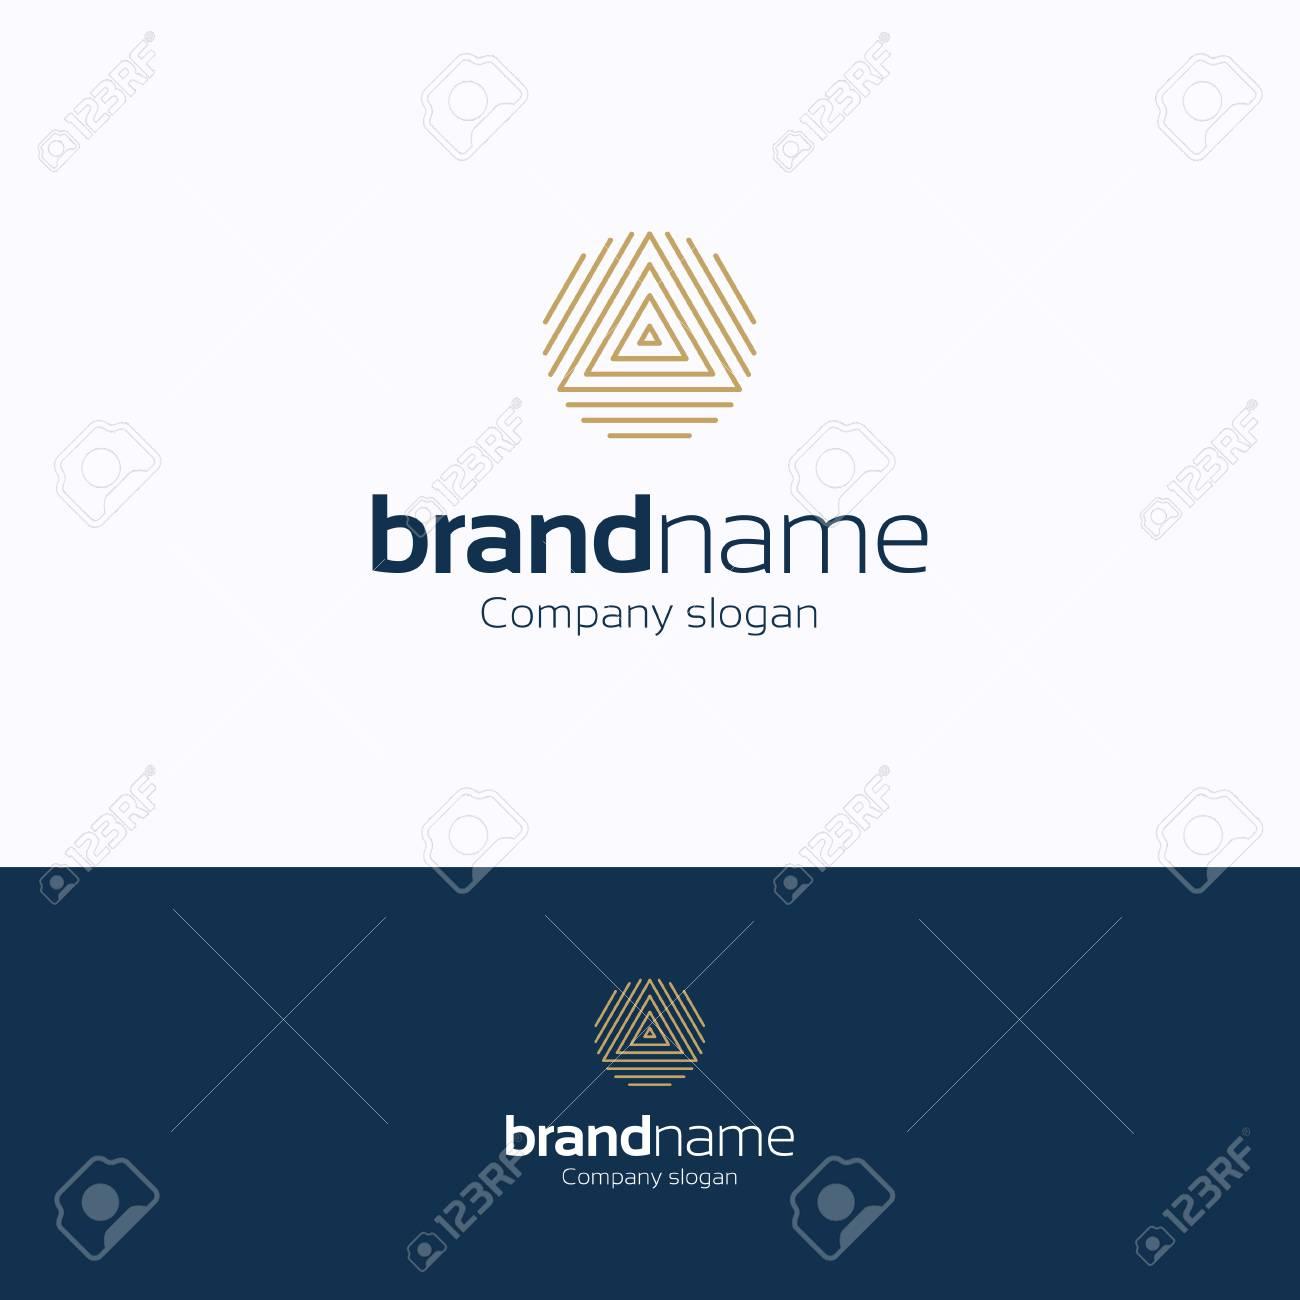 brand name logo logo fingerprints gold blue logotype symmetry